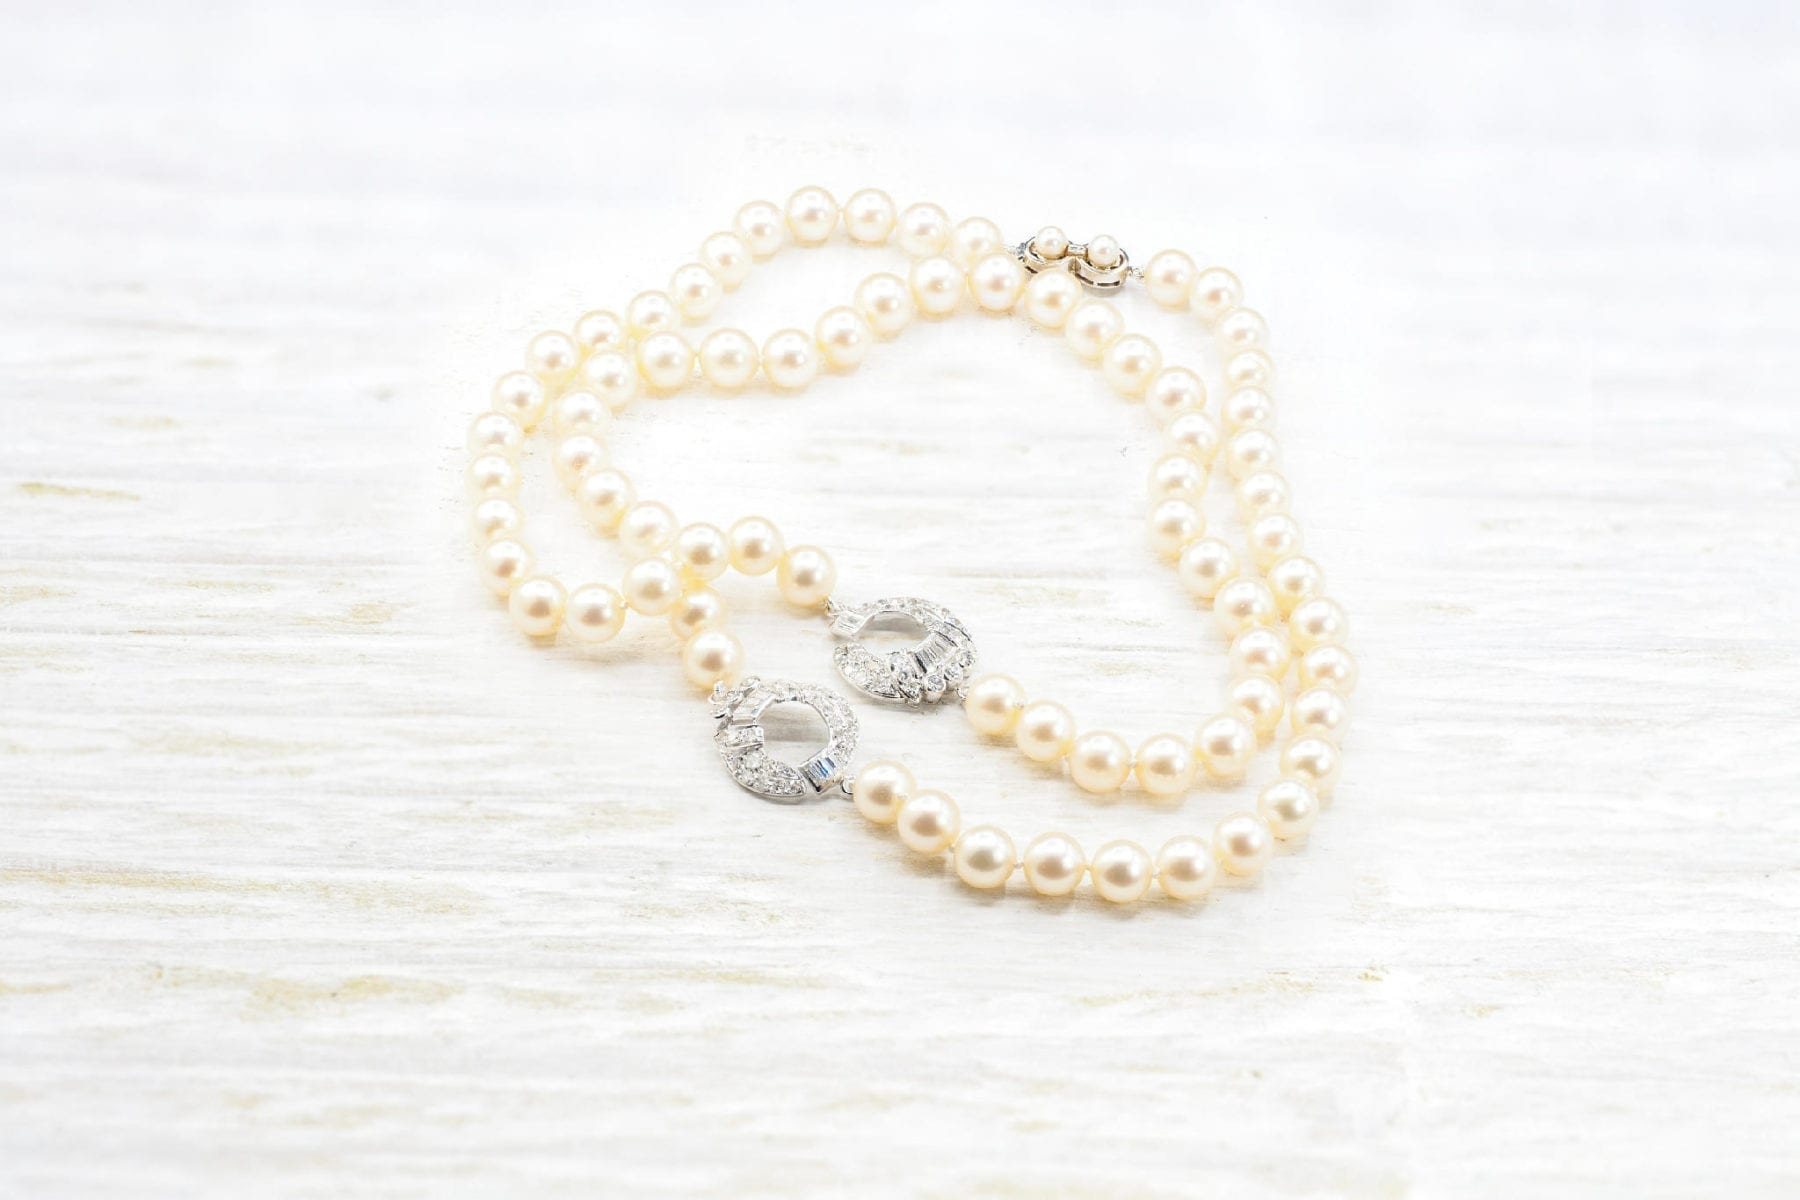 Collier de perles de culture fermoir en or blanc 18k